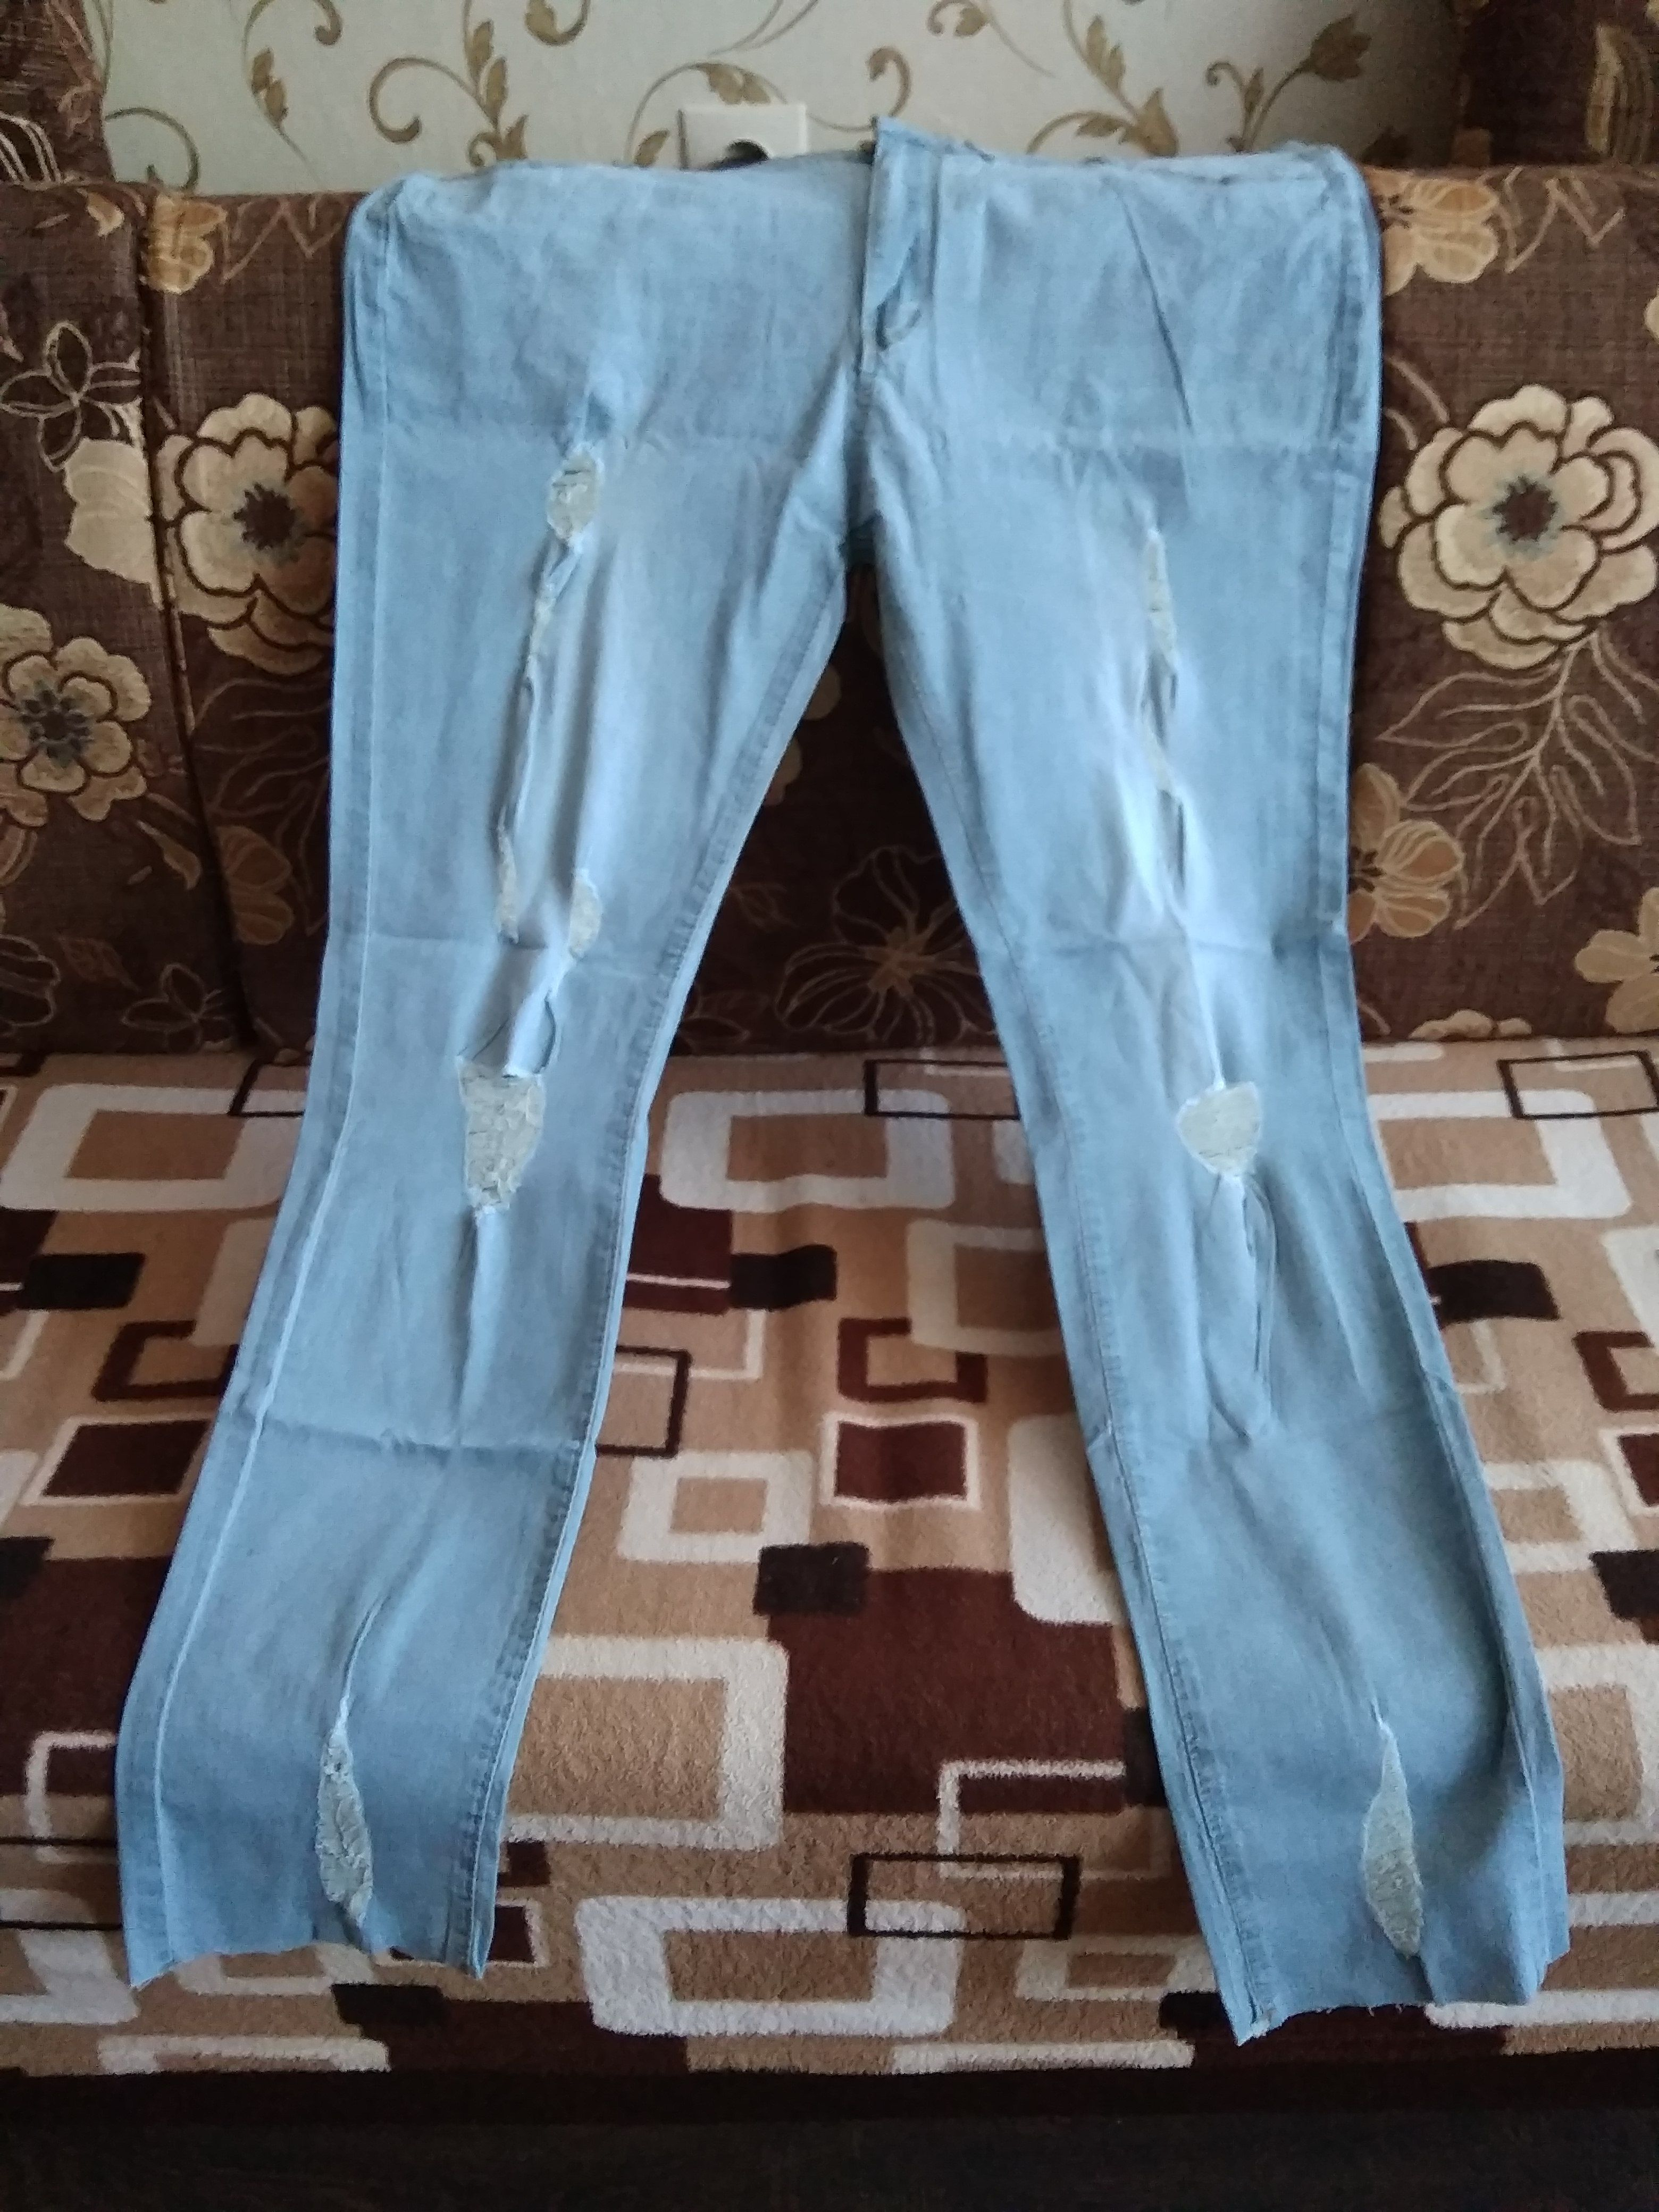 f34cc069754 Romacci Women Plus Size Ripped Jeans 5XL 6XL 7XL Slim Denim Destroyed -  sheheonline